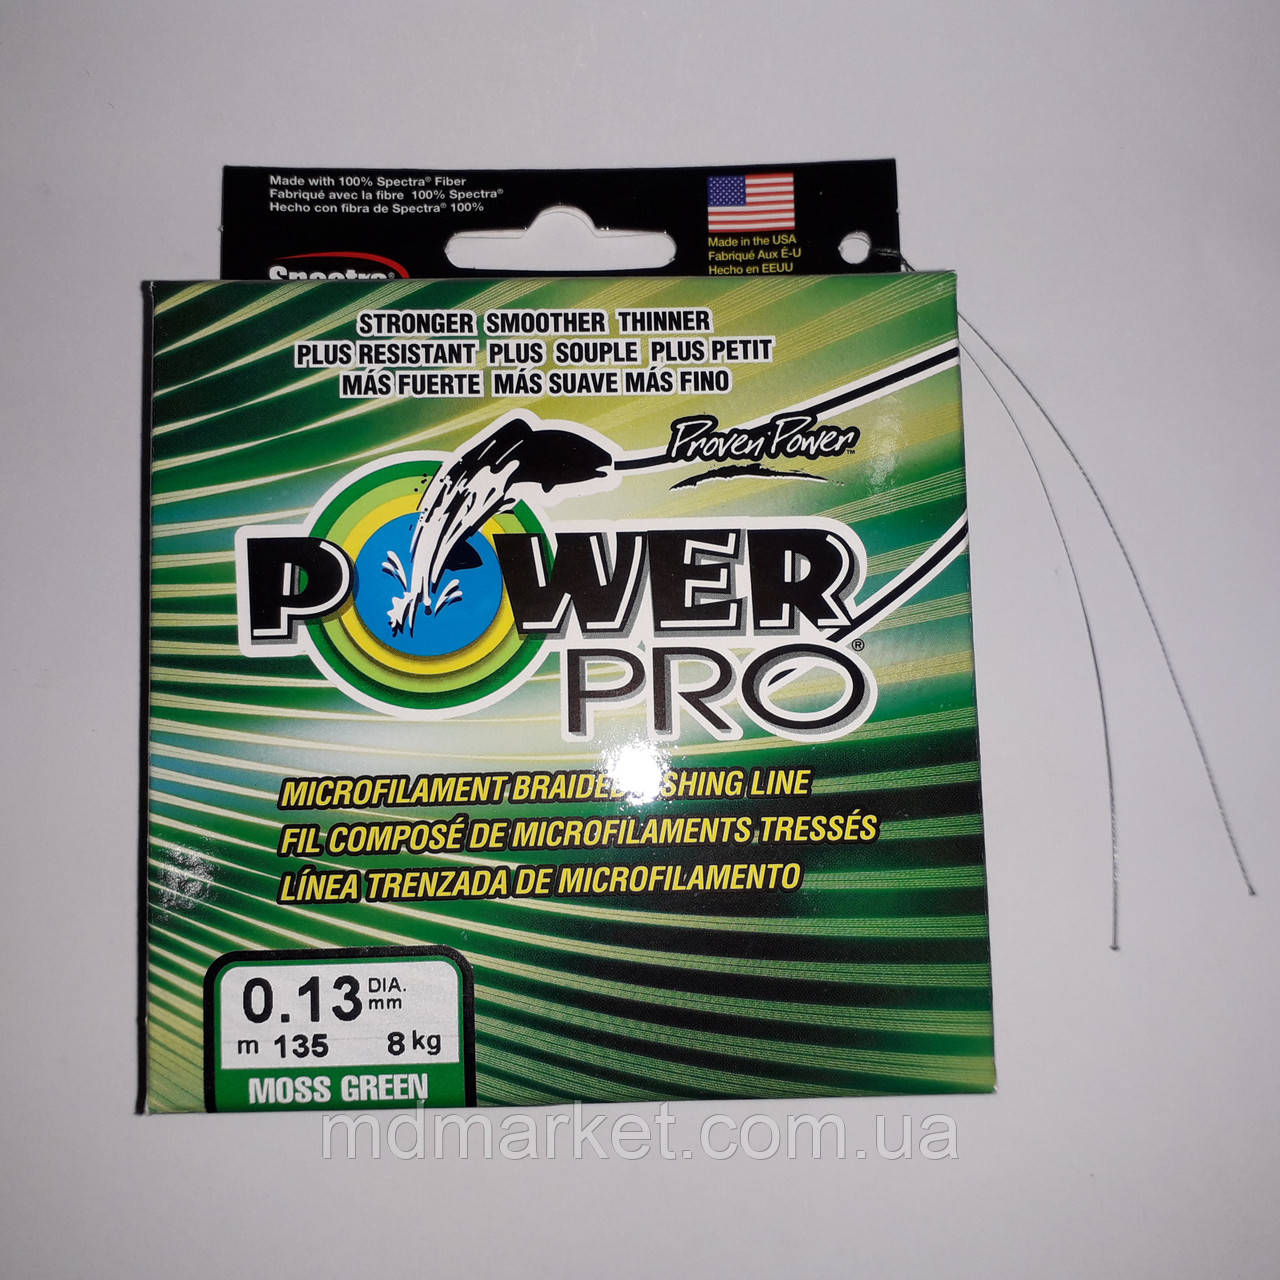 Шнур power pro оригинал 135м 0.13мм